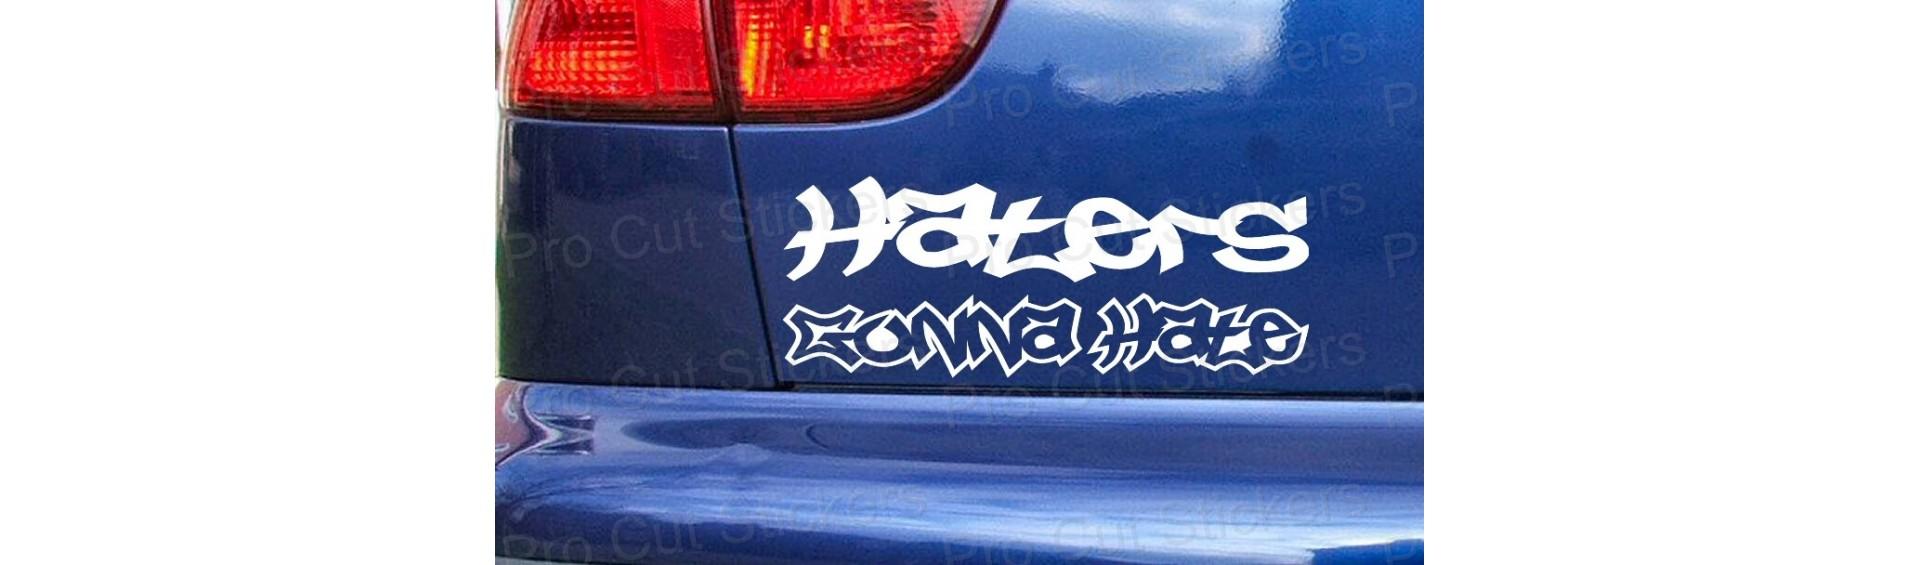 Haters Scene Stickers